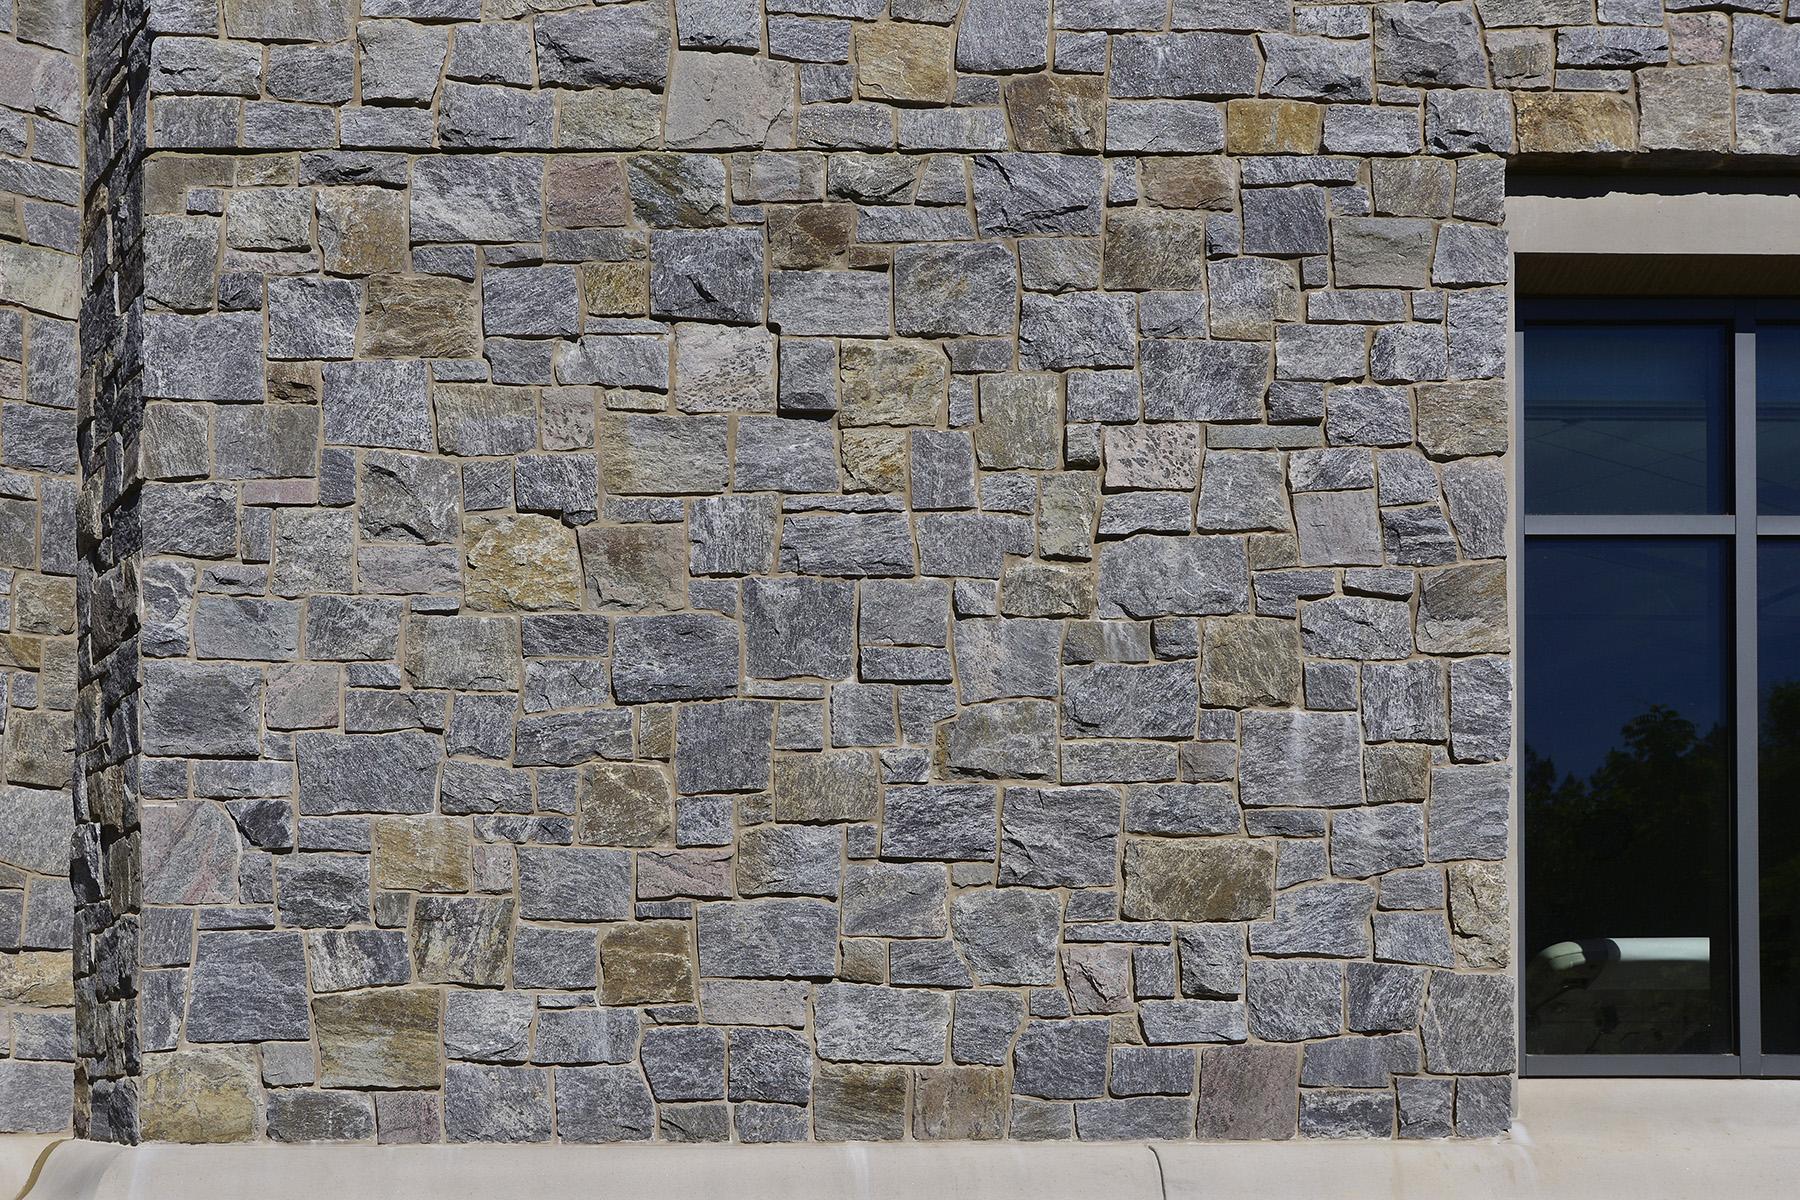 stone wall exterior